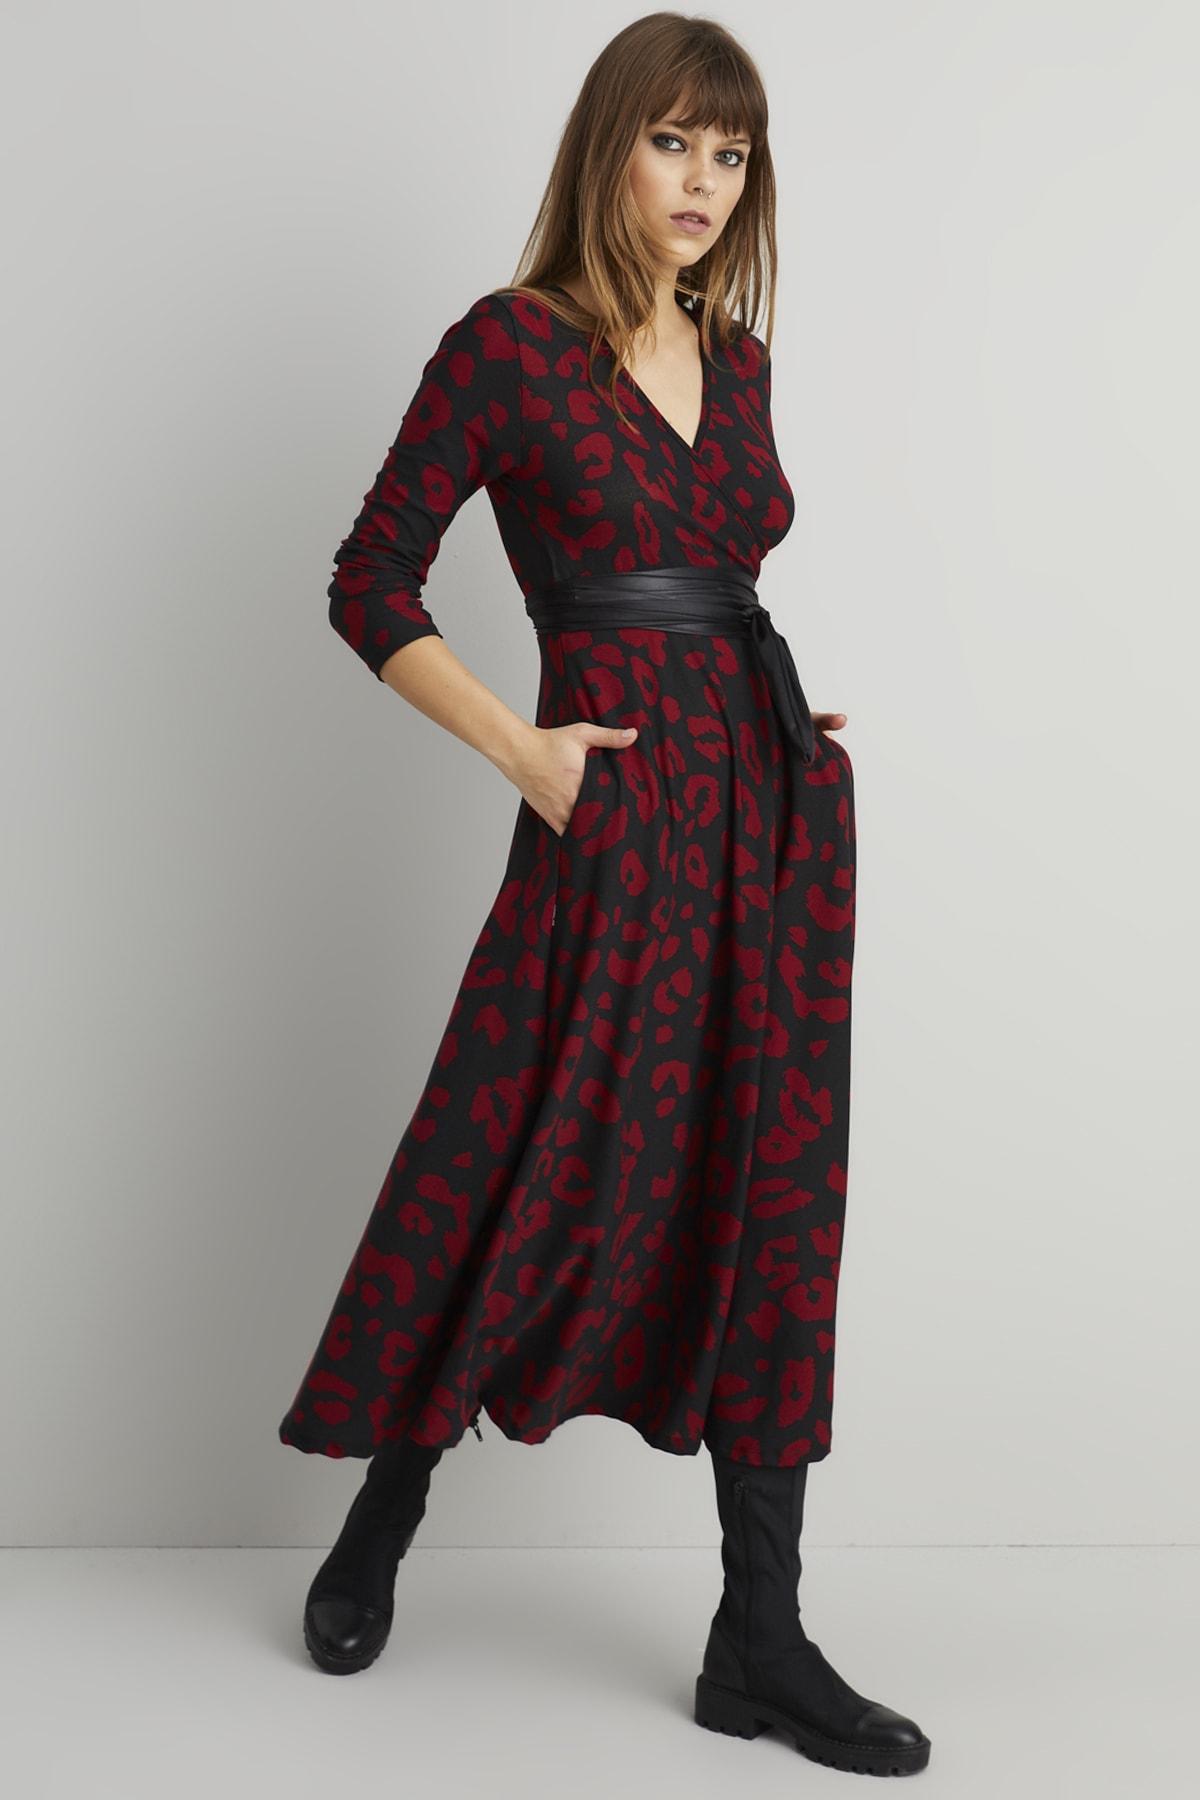 Cool & Sexy Kadın Siyah-Bordo Leopar Desen Kruvaze Maxi Elbise ARZ21 1